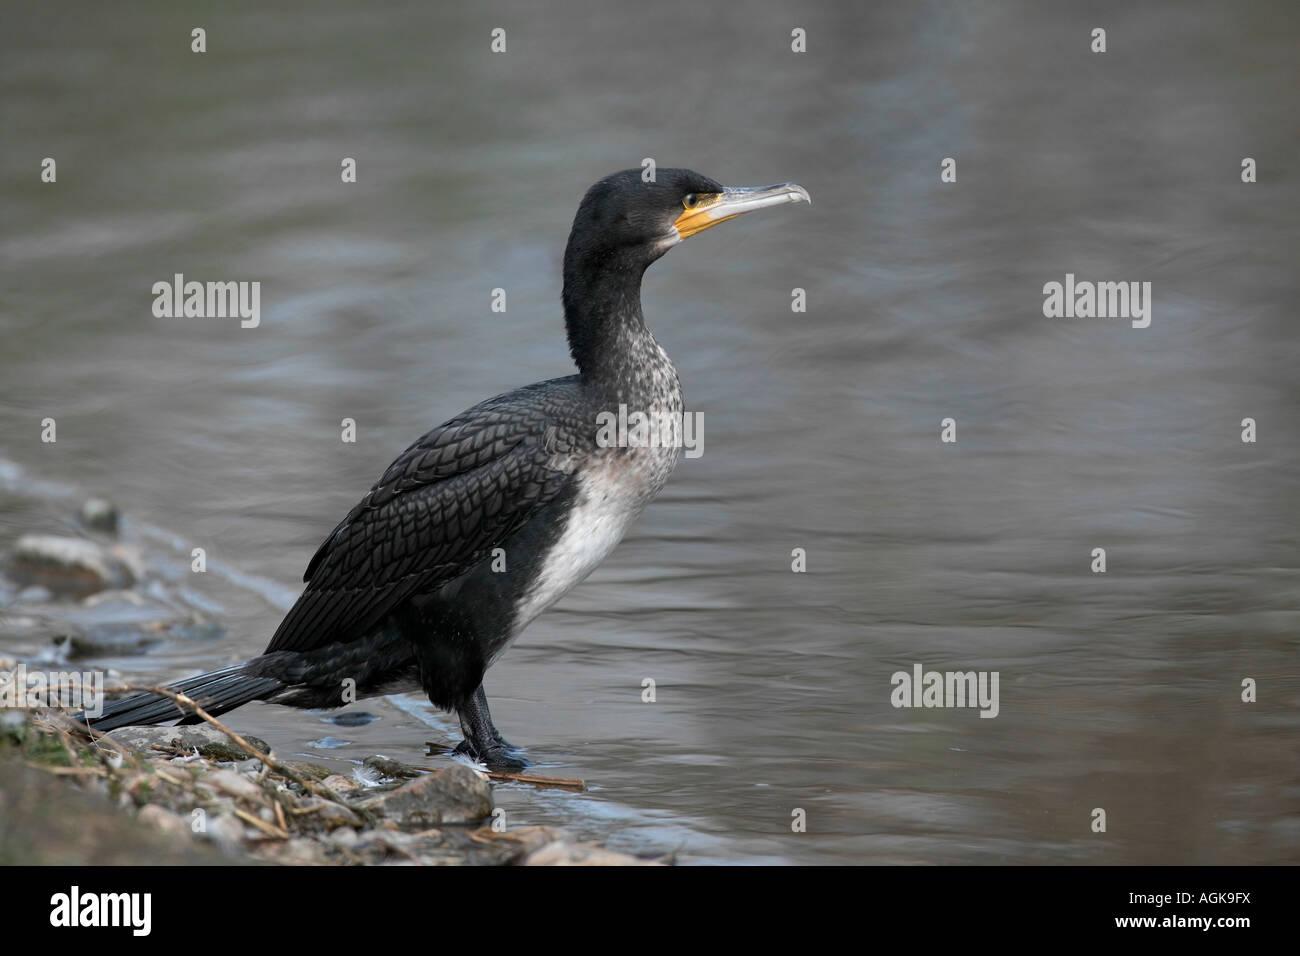 Kormoran Phalacrocorax carbo sitzt am Wasser Great Cormorant  near water - Stock Image